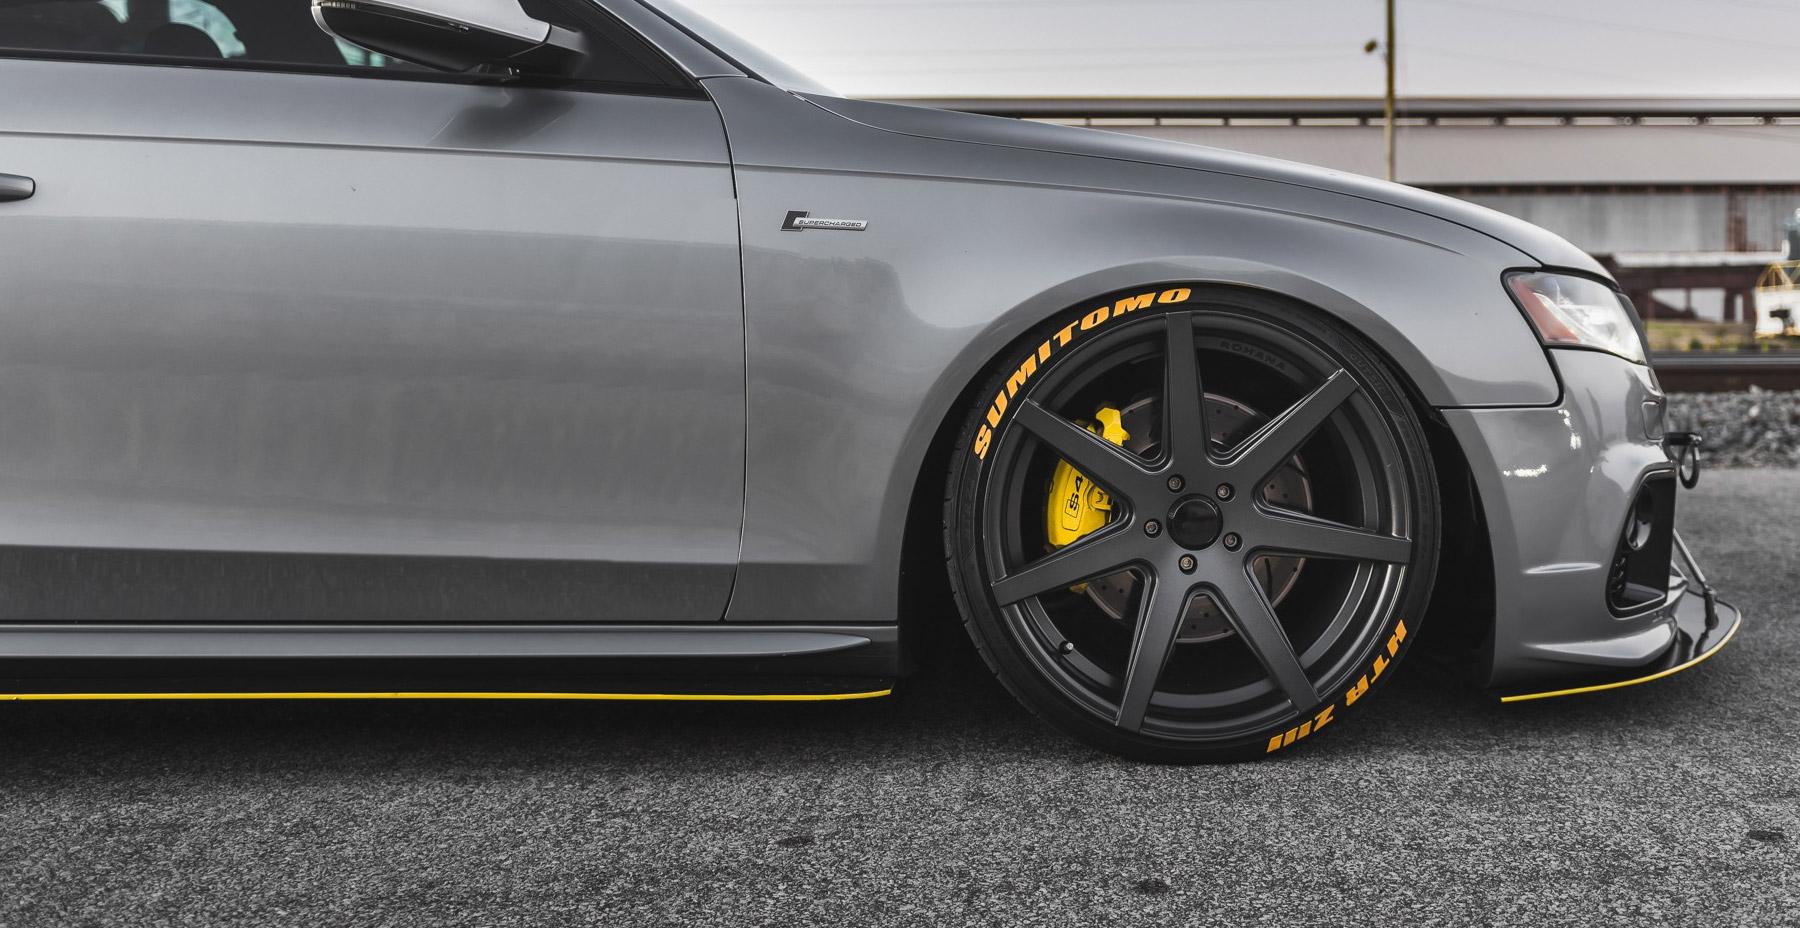 Grey Audi S4 x Rohana RC7 Wheels (Finished in Graphite Wheel)